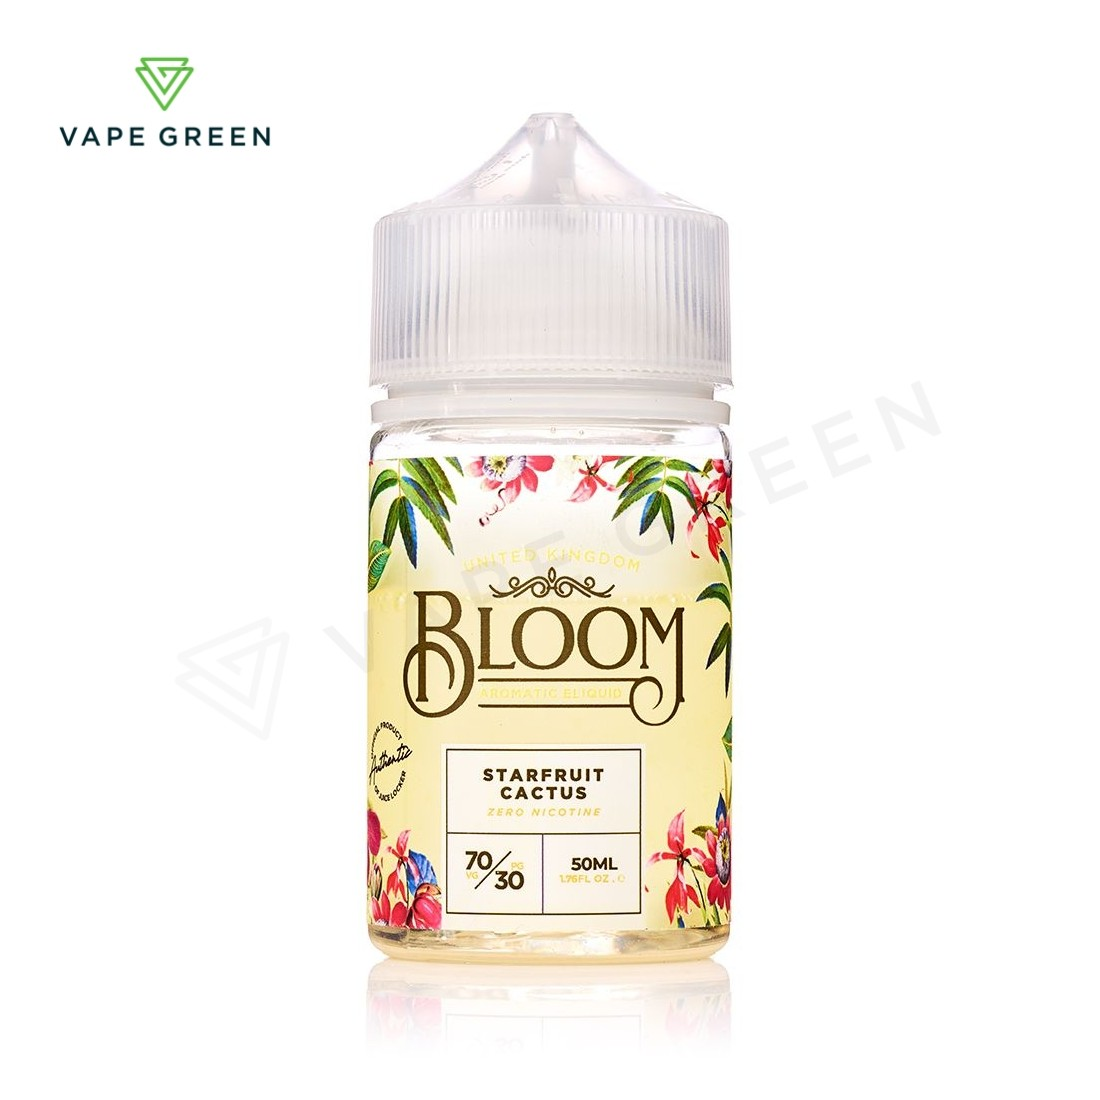 Starfruit Cactus E-Liquid by Bloom 50ml